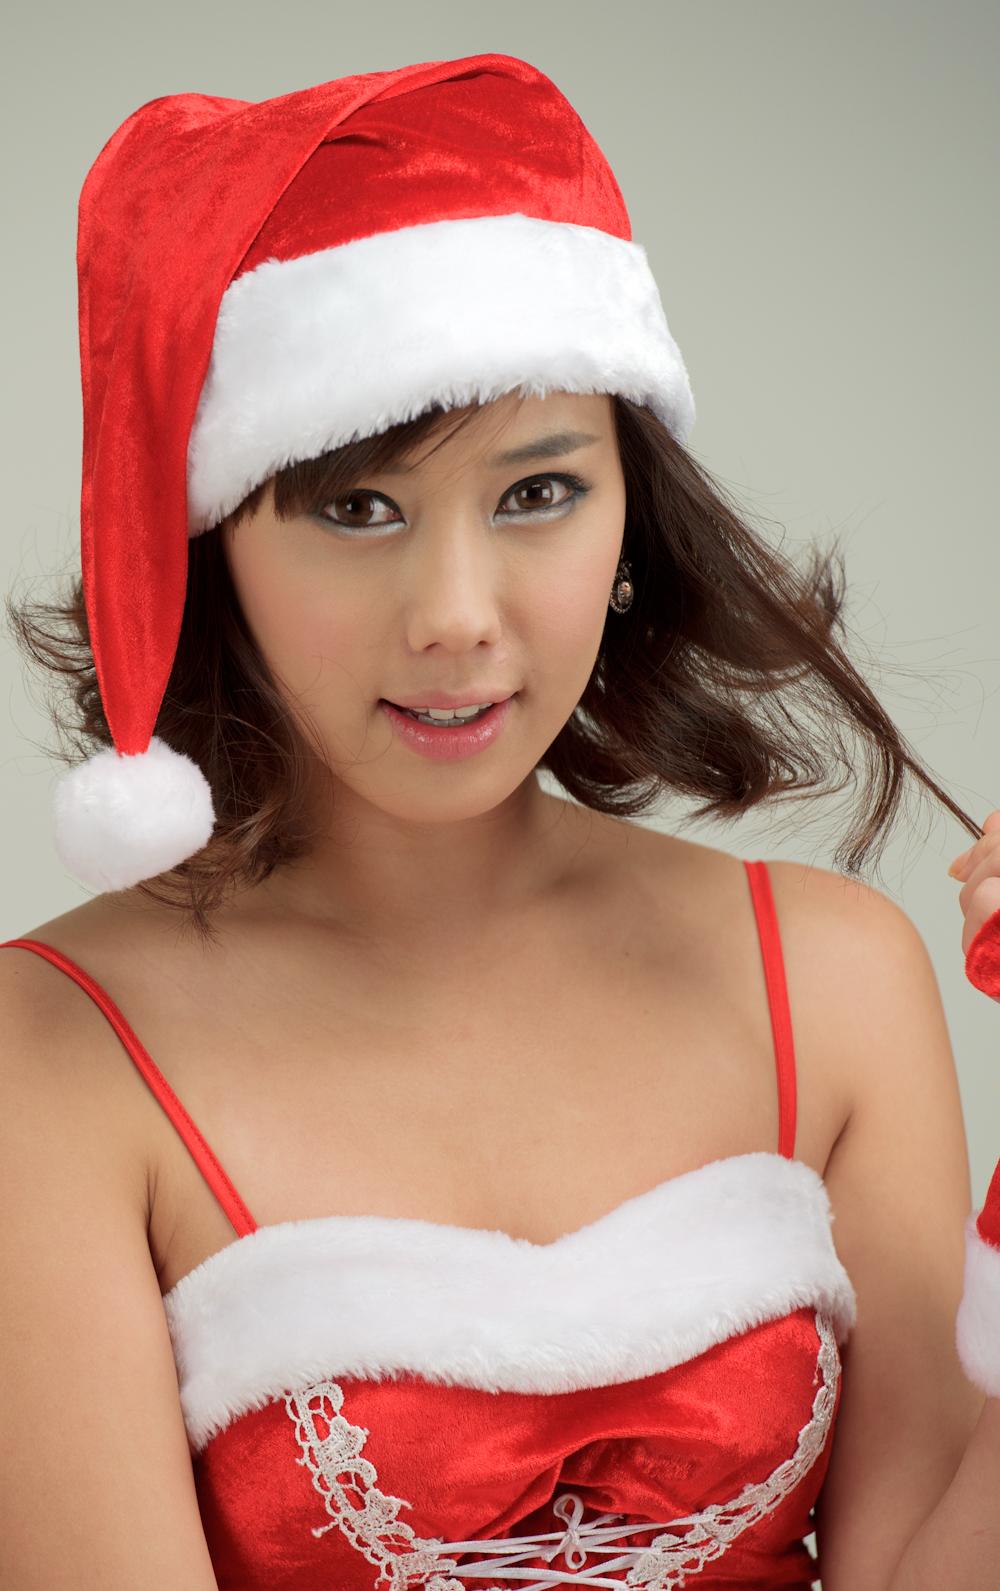 Latest Fashion Model Kim Ha Yul Beautiful And Amazing Photo Gallery